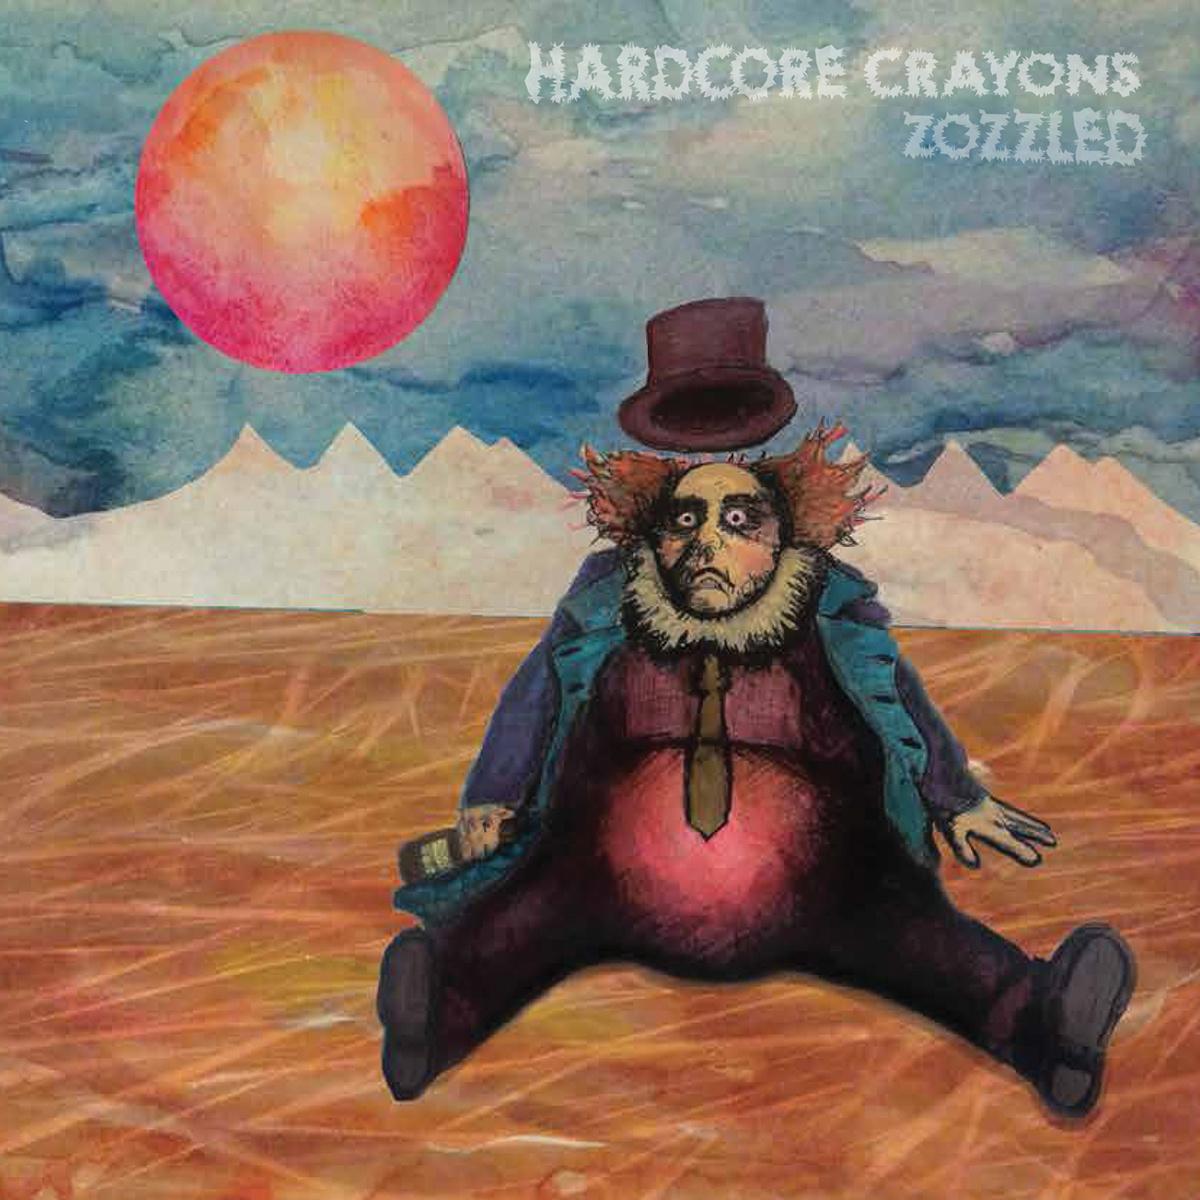 Hardcore Crayons – Zozzled